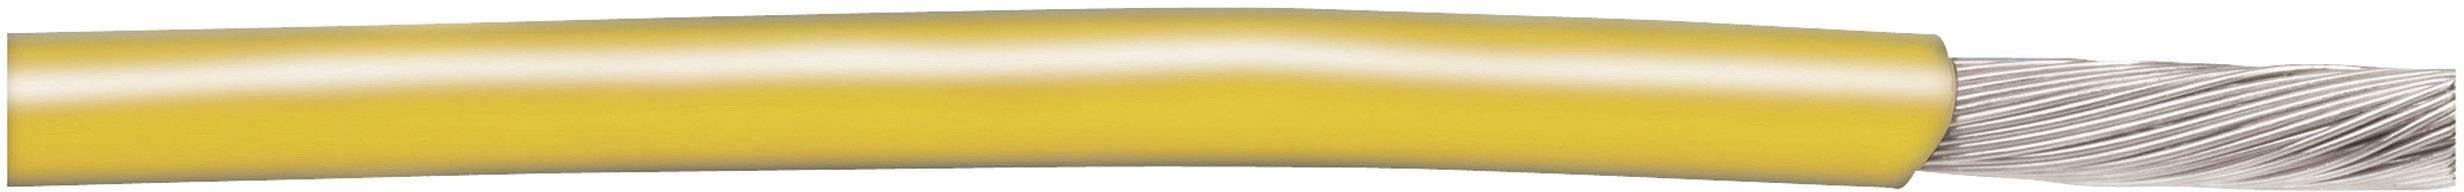 Opletenie / lanko AlphaWire 3075 WH001 1 x 0.82 mm², vonkajší Ø 2.81 mm, metrový tovar, biela